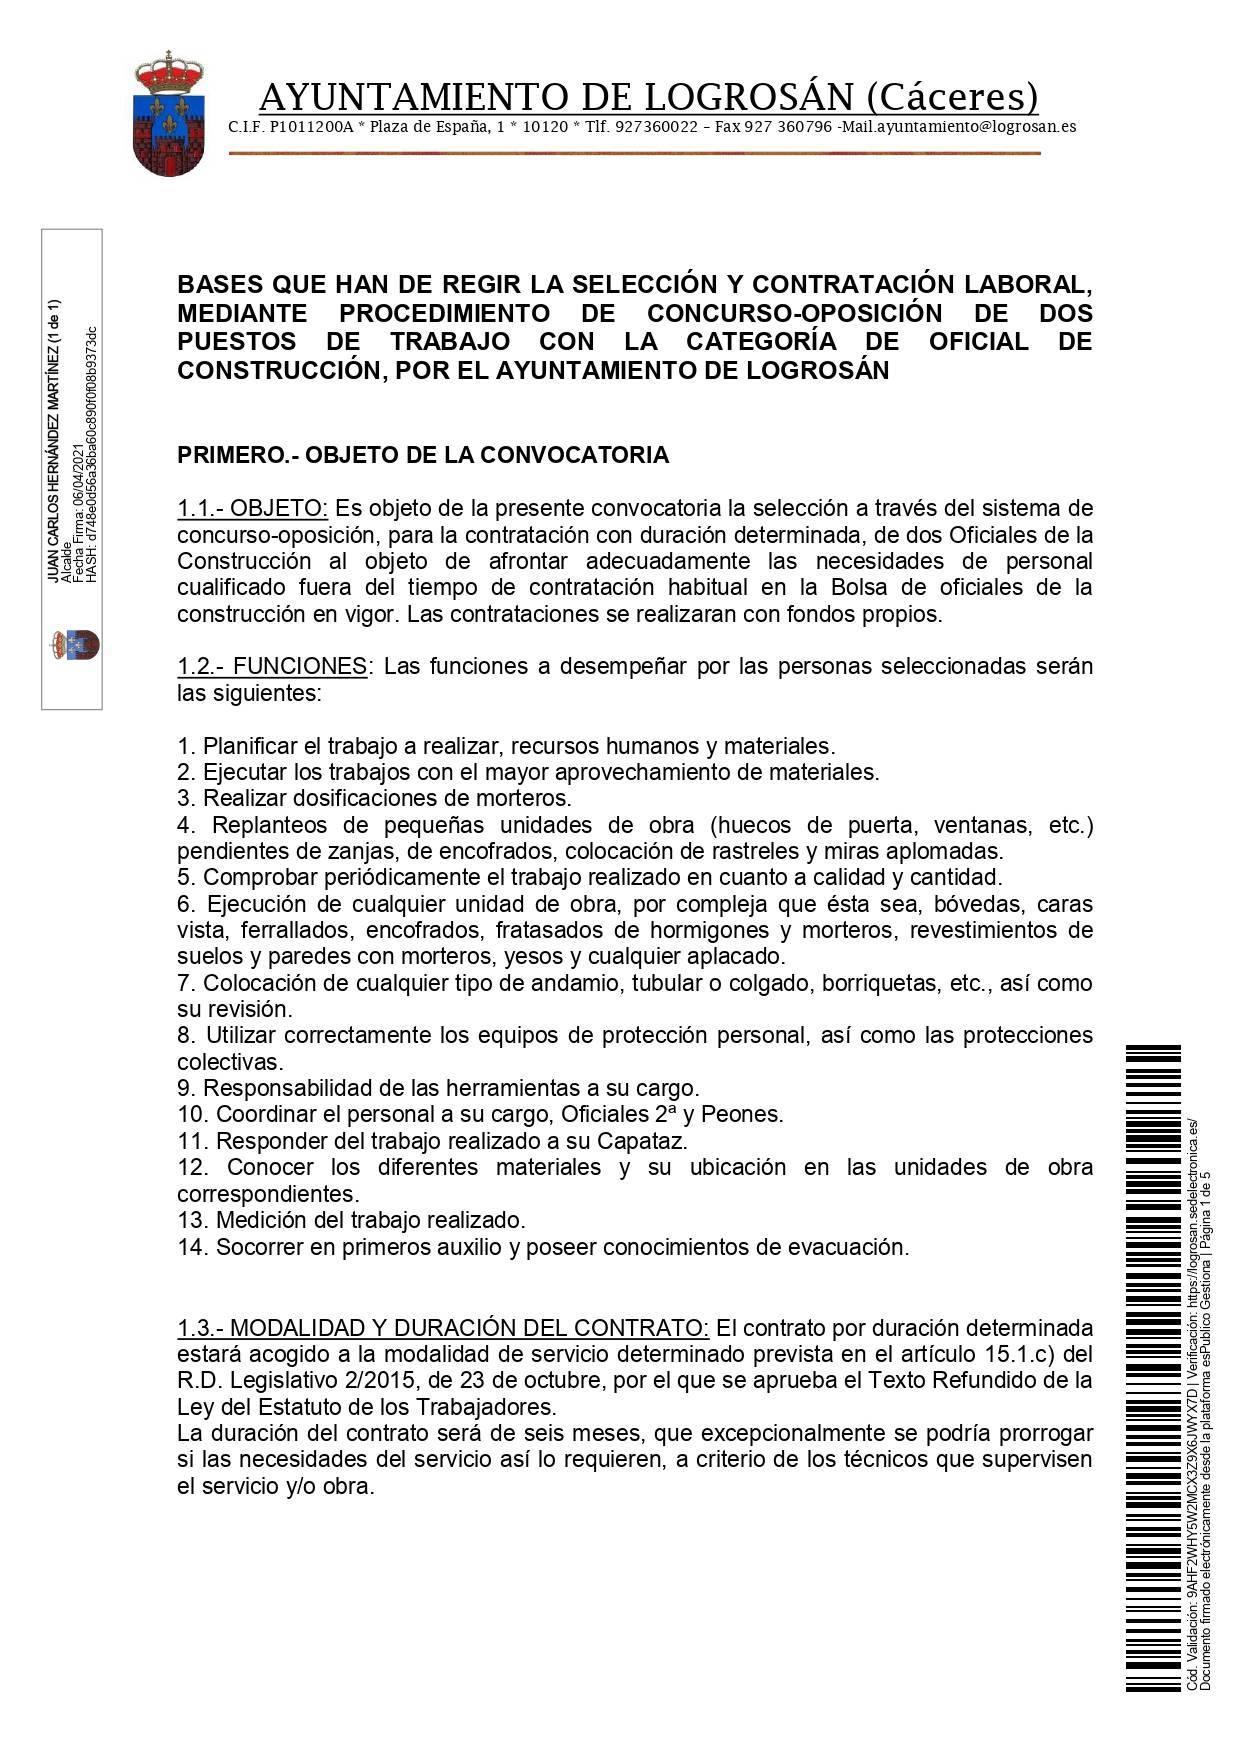 2 oficiales de construcción (2021) - Logrosán (Cáceres) 1